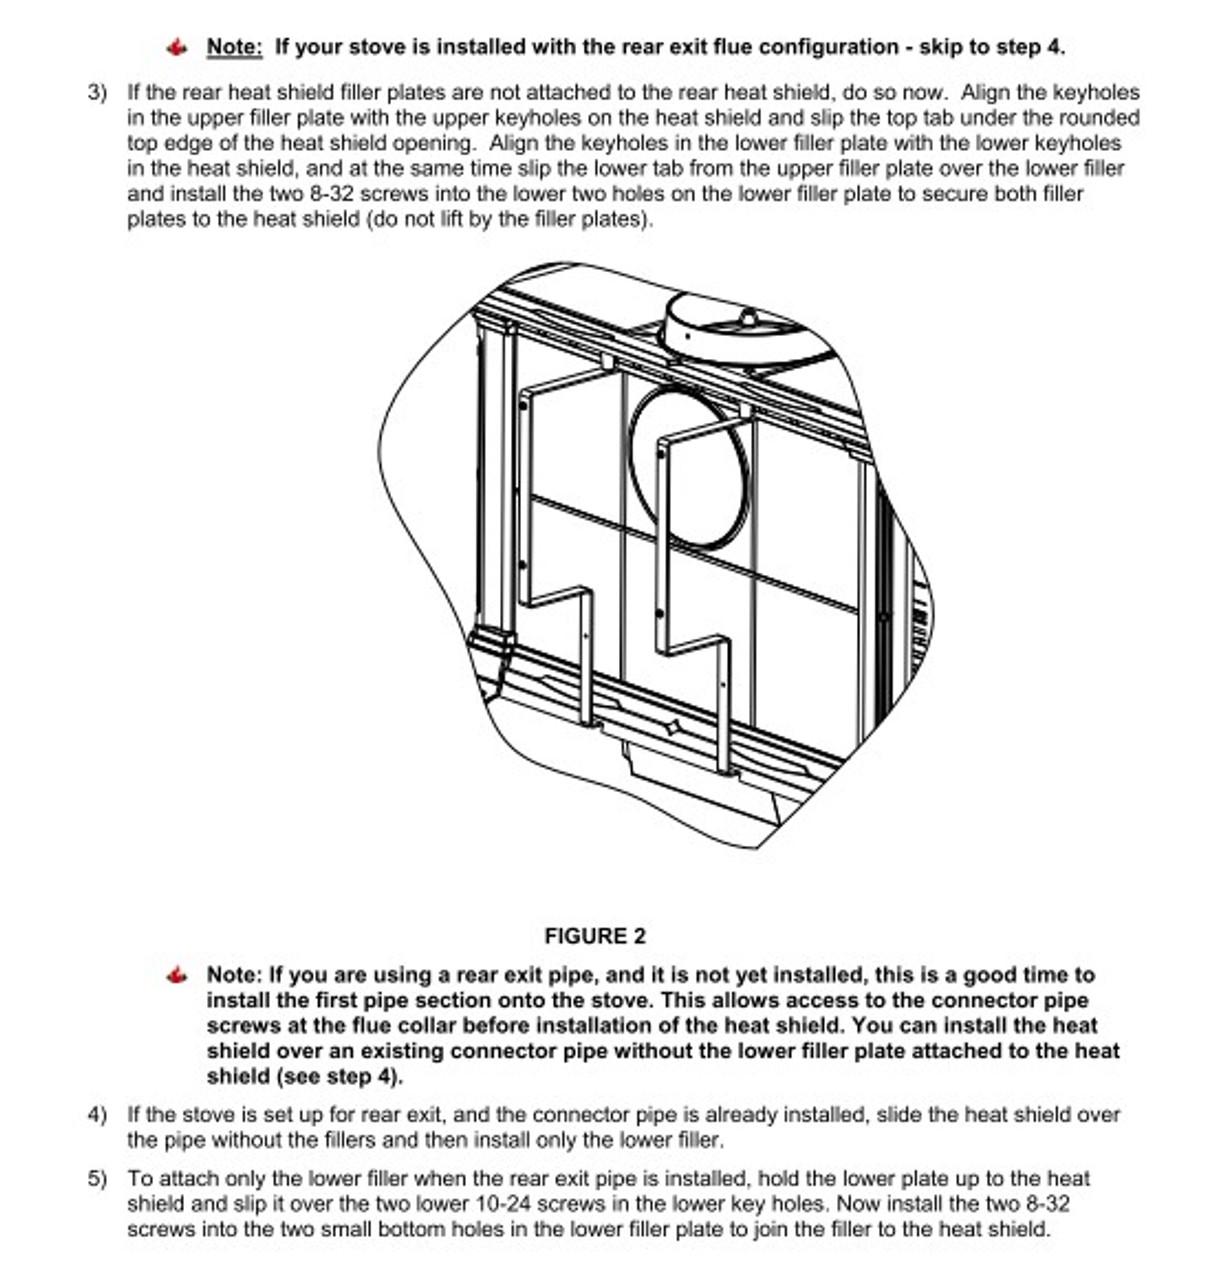 HearthStone Equinox Rear Heat Sheild